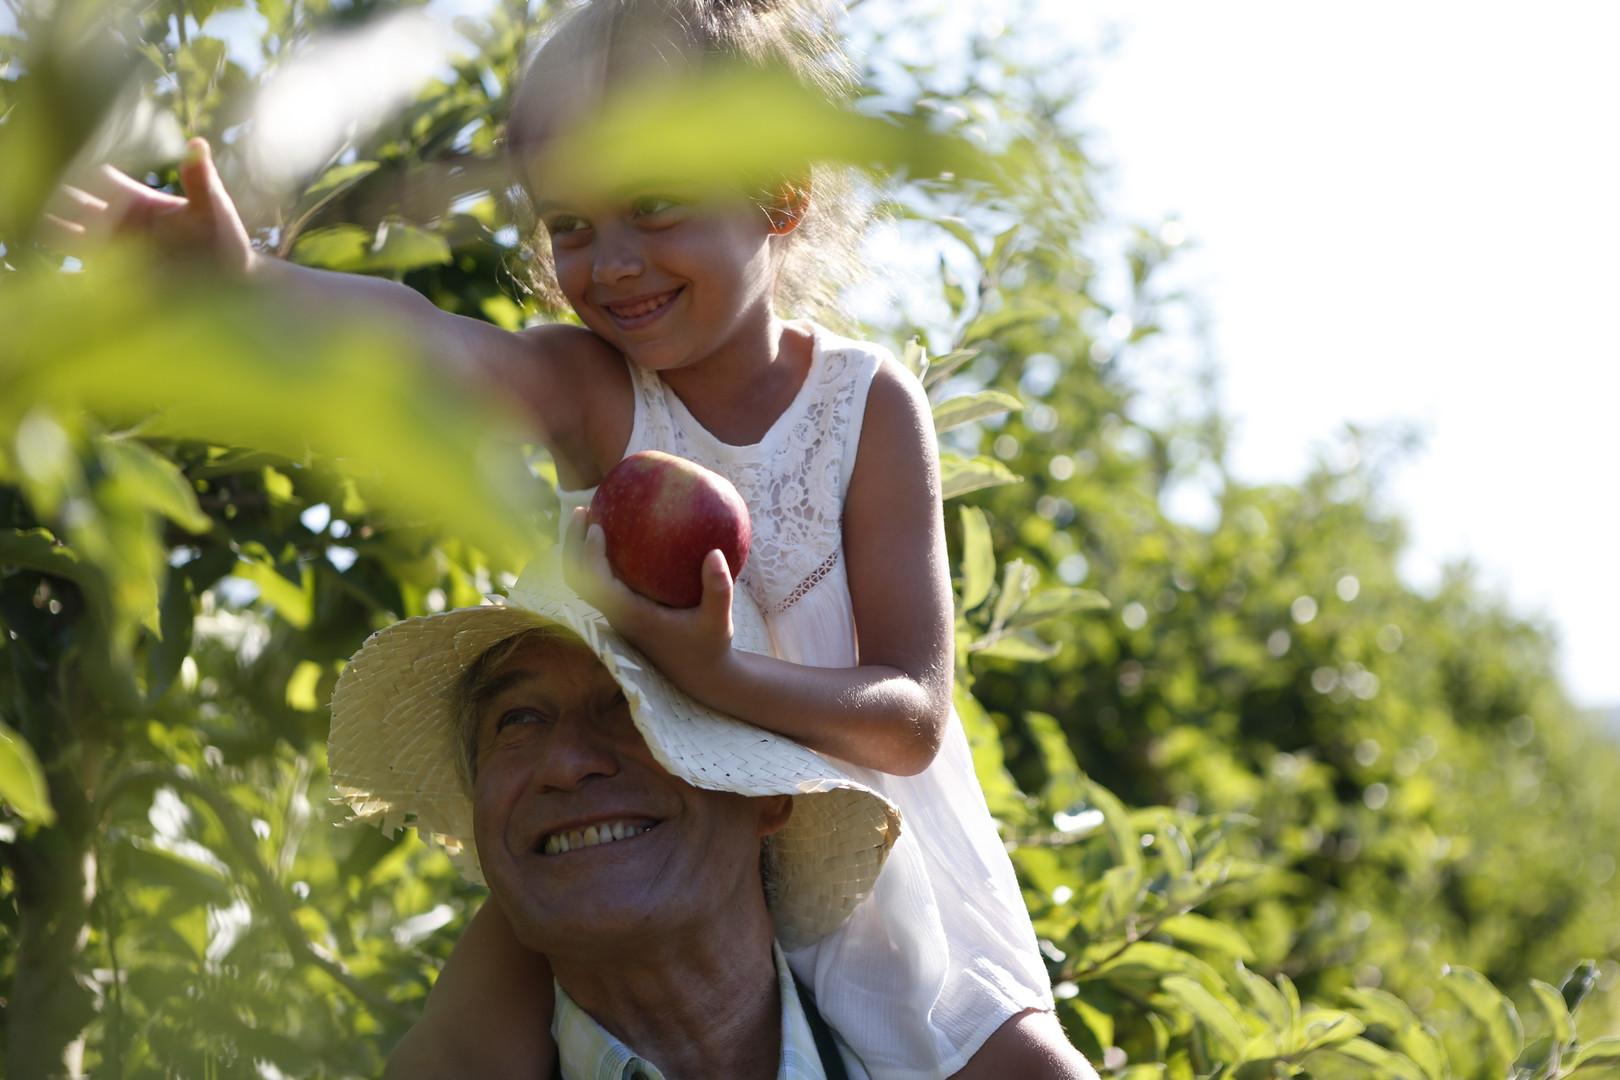 Hero_day 2_apple garden grandpa__S4U8638